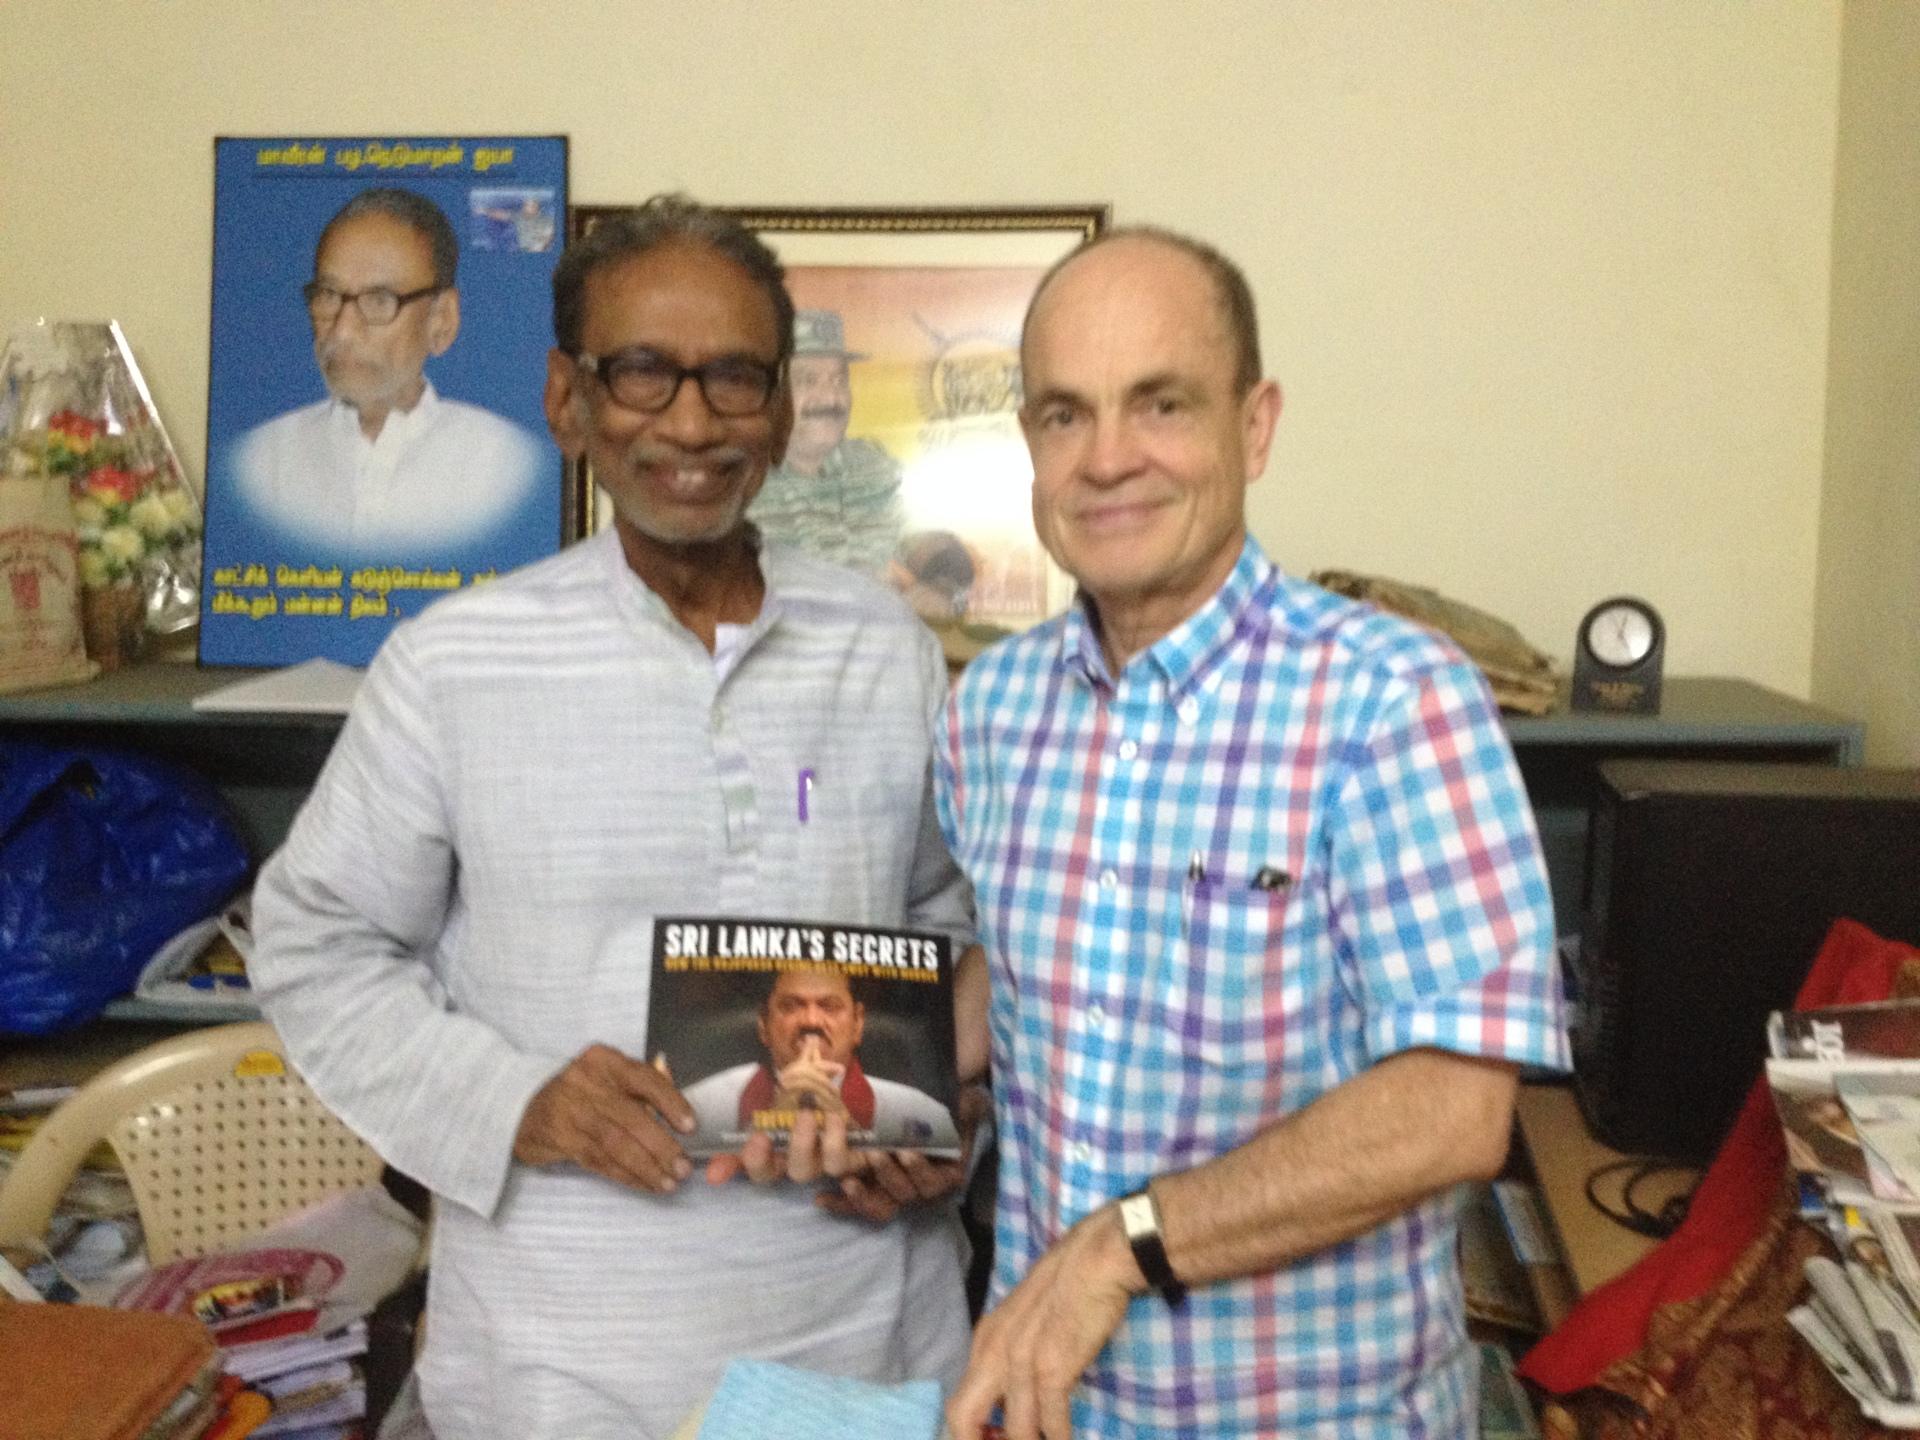 Trevor Grant, former spokesperson of TRC, with veteran Tamil politician Pazha Nedumaran